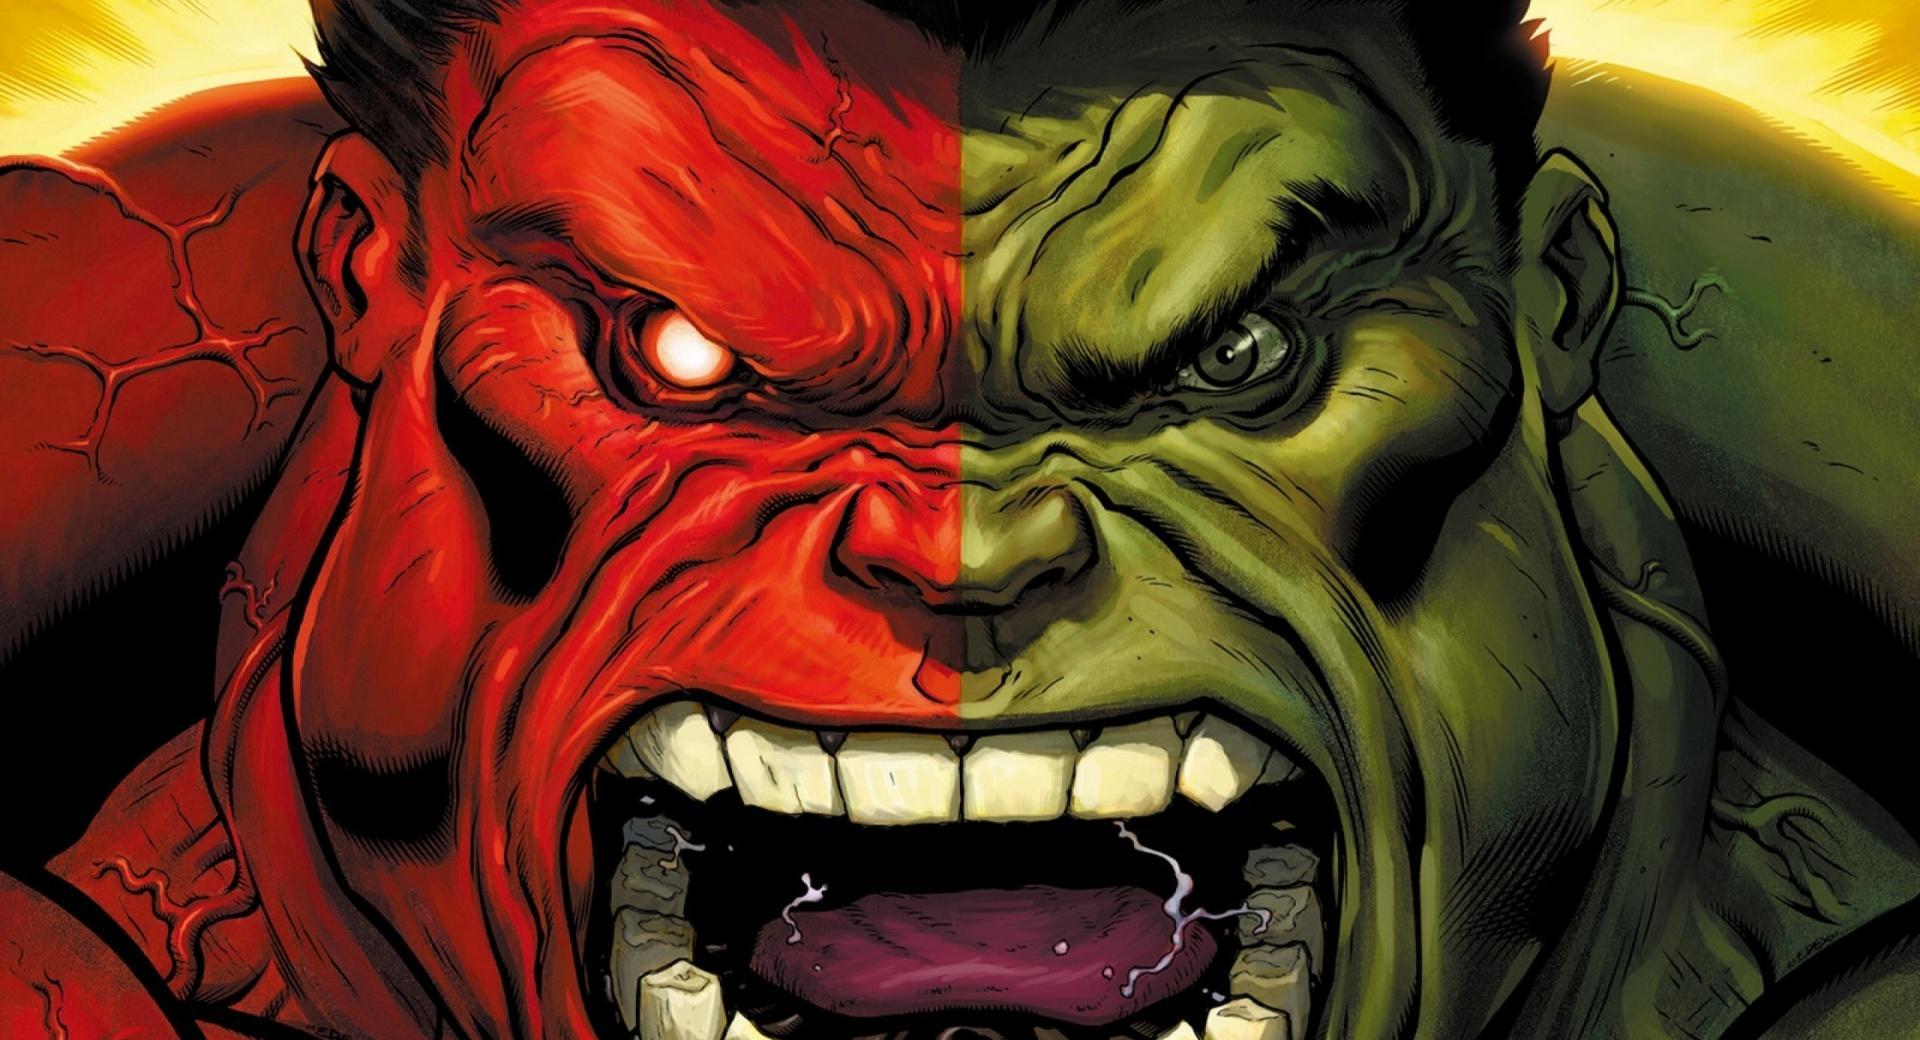 Red Hulk vs Green Hulk wallpapers HD quality